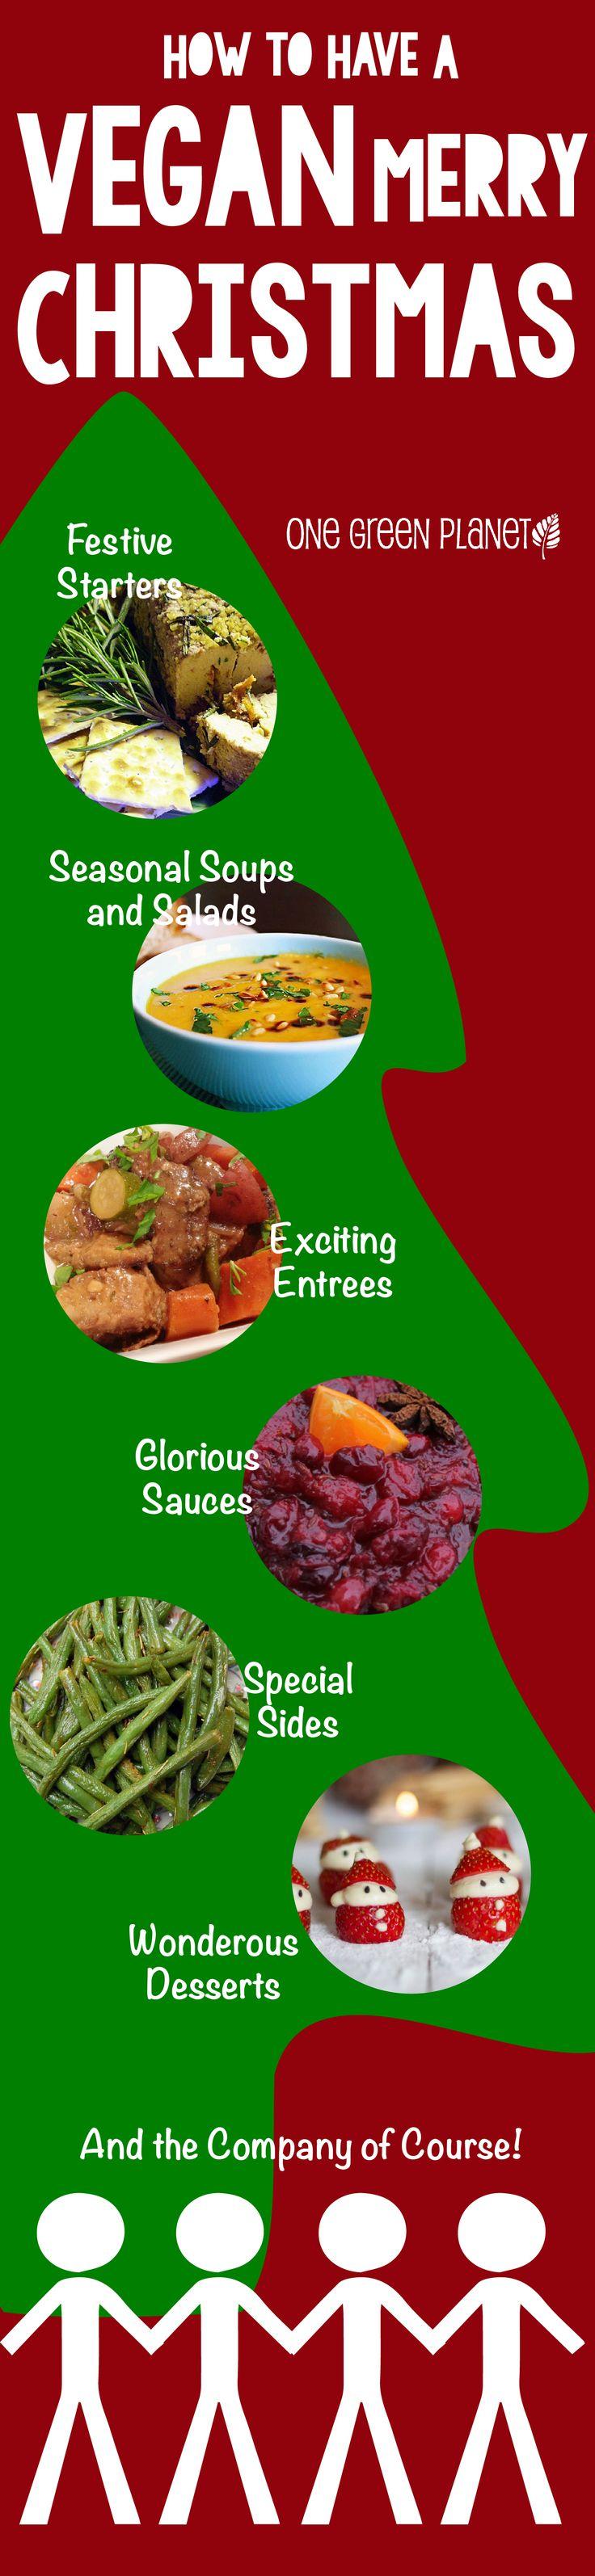 http://onegr.pl/1AXSLt7 #vegan #vegetarian #christmas #holidays #howto #recipes